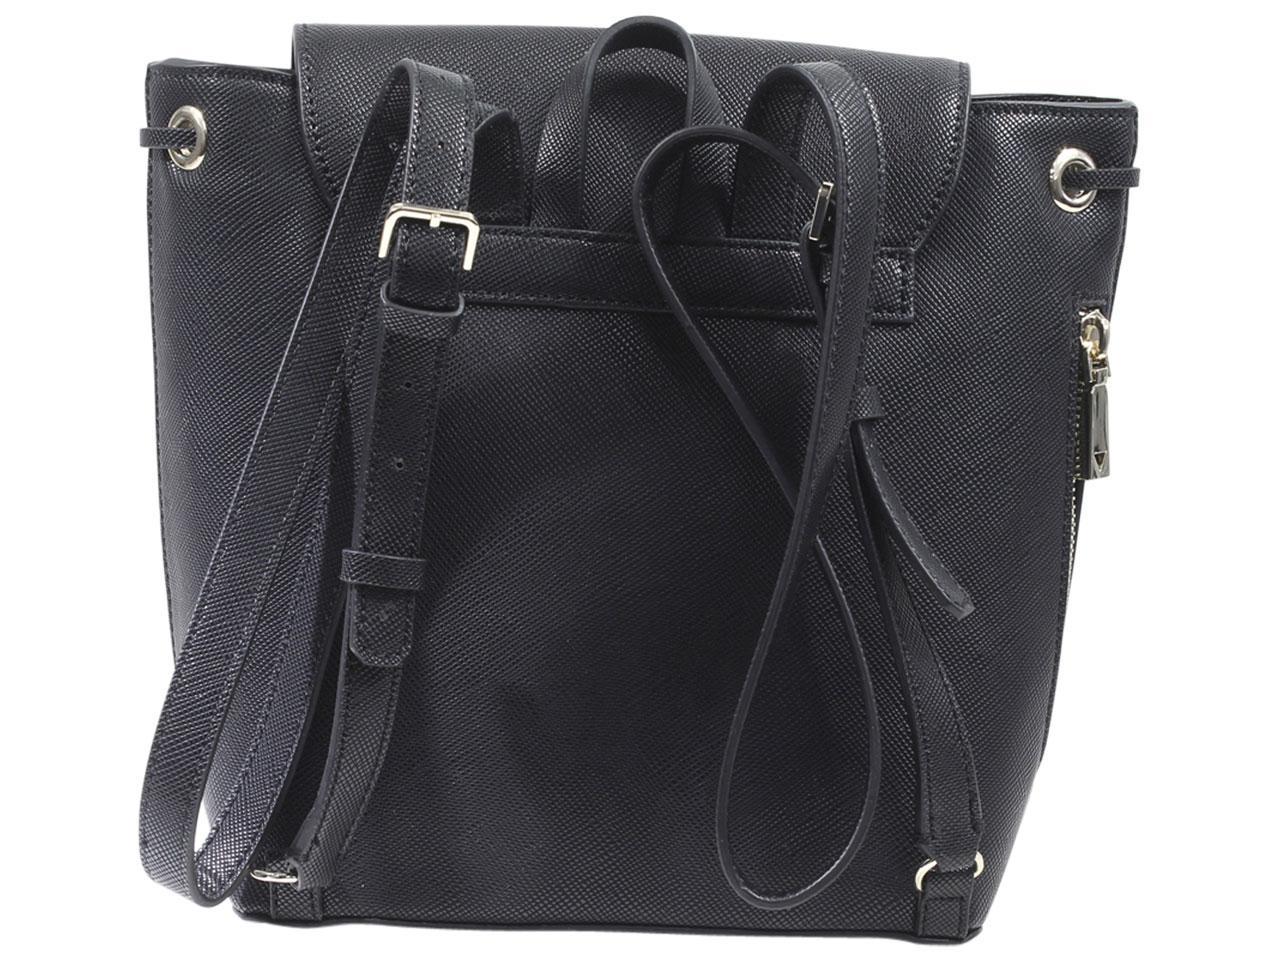 Guess-Women-039-s-Varsity-Pop-Pin-Up-Backpack-Bag thumbnail 8